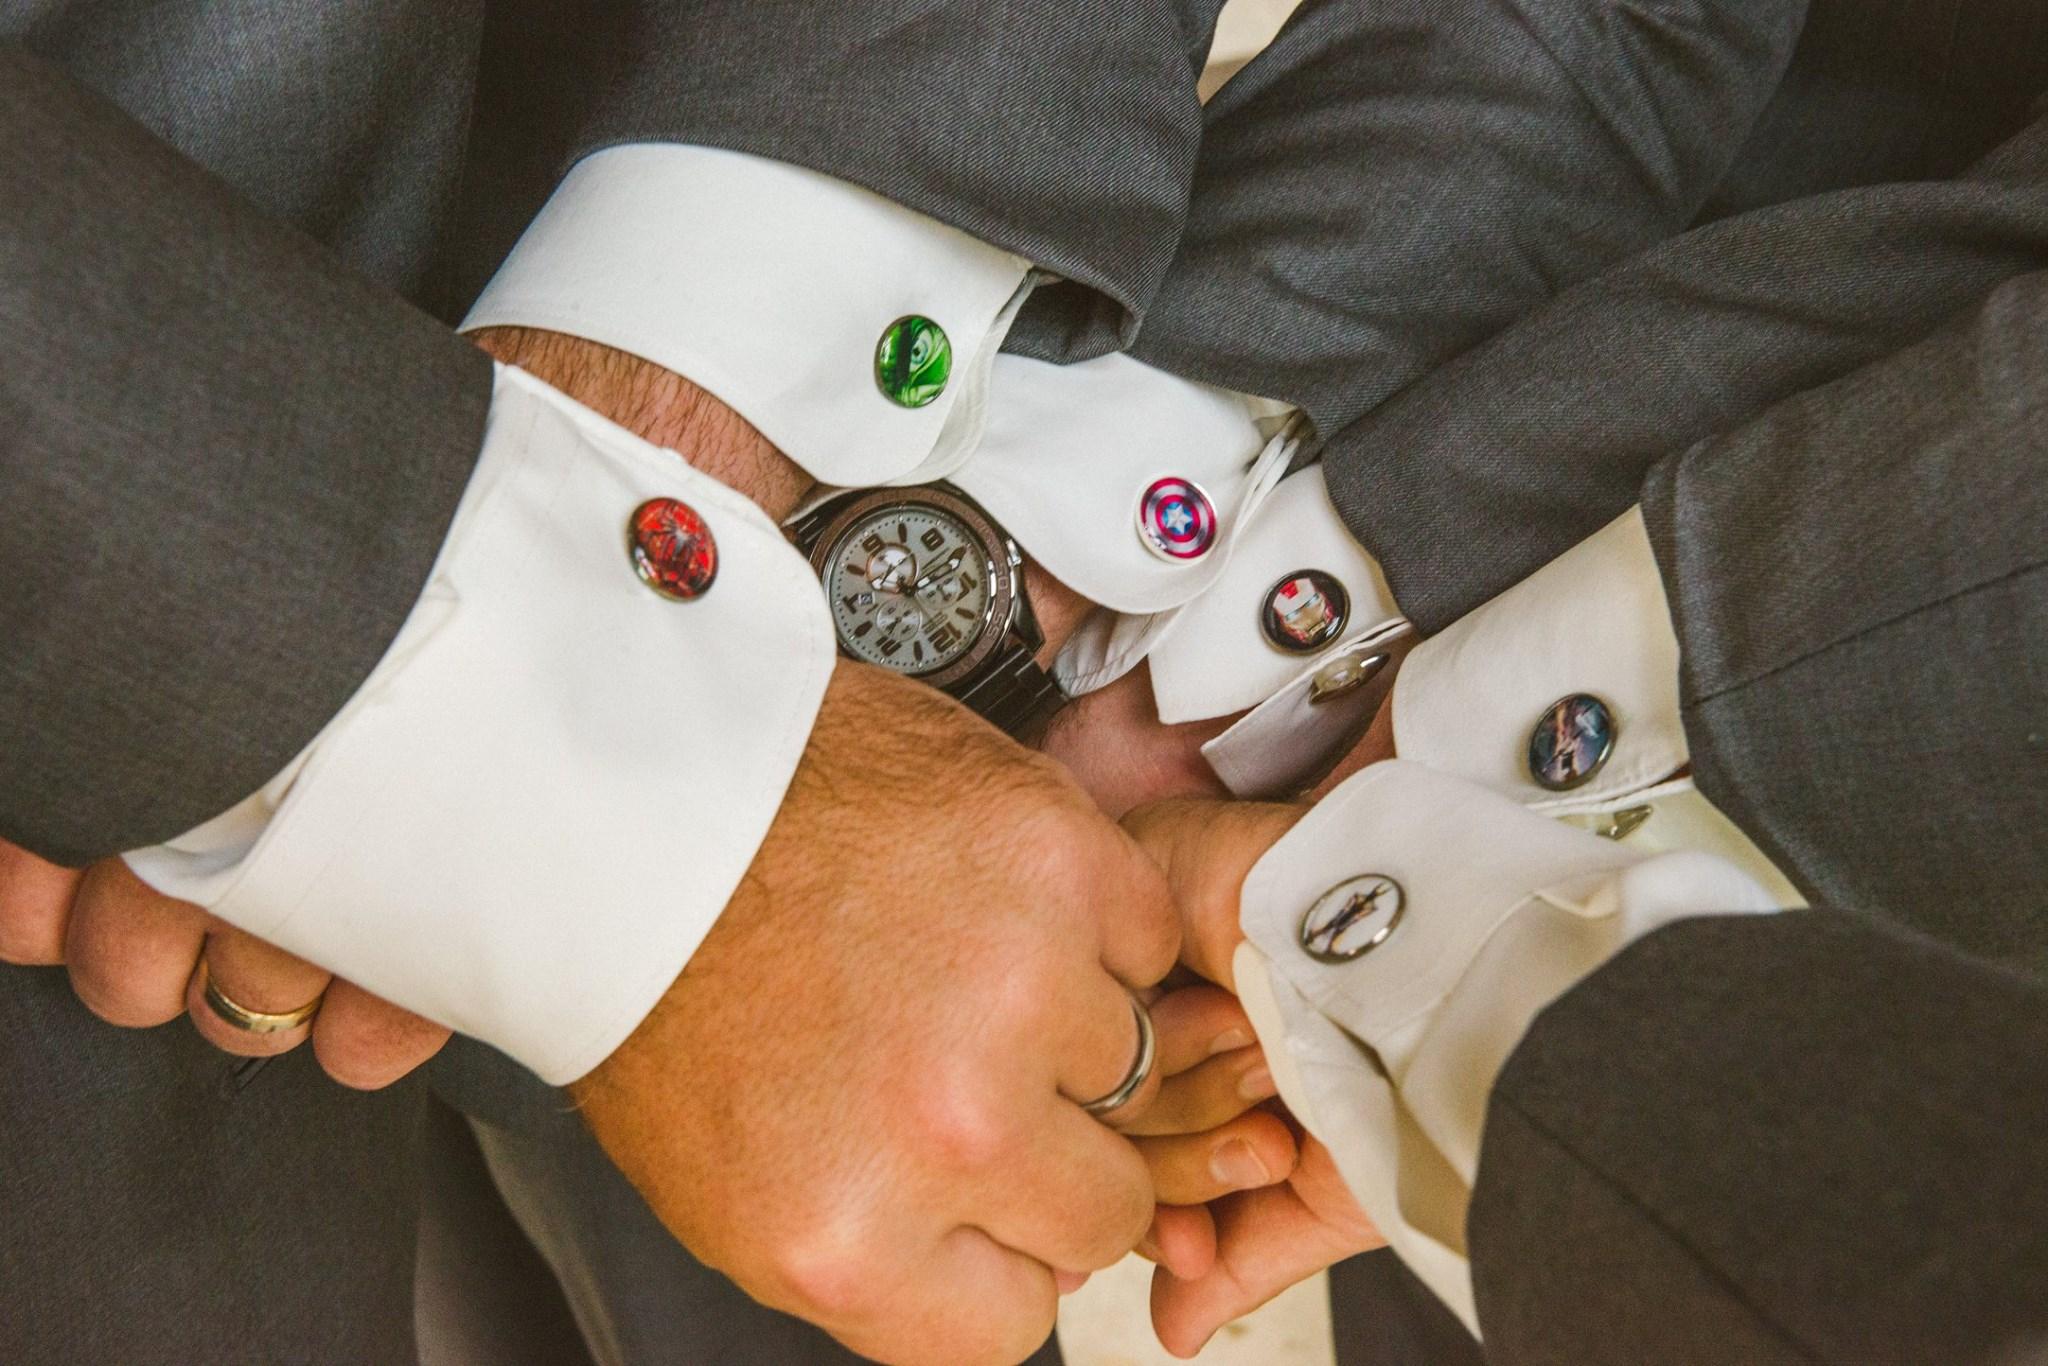 mercyful_fate_logo_cuff_links_men_weddings_grooms_groomsmen_gifts_dads_graduations_cufflinks_2.jpg